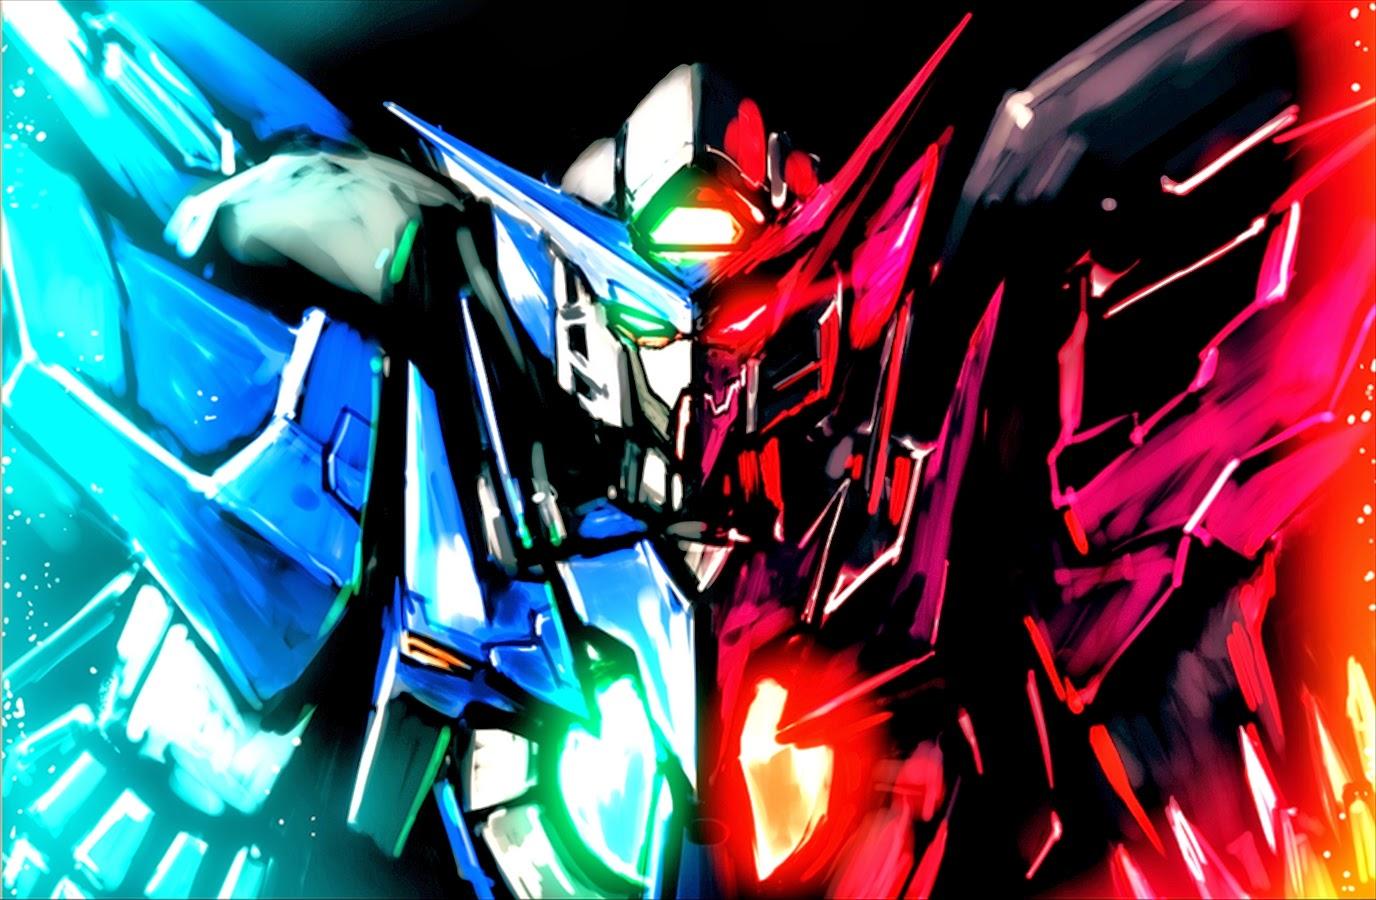 Gundam exia dark matter wallpaper poster image fanmade gundam exia dark matter wallpaper poster image fanmade voltagebd Images